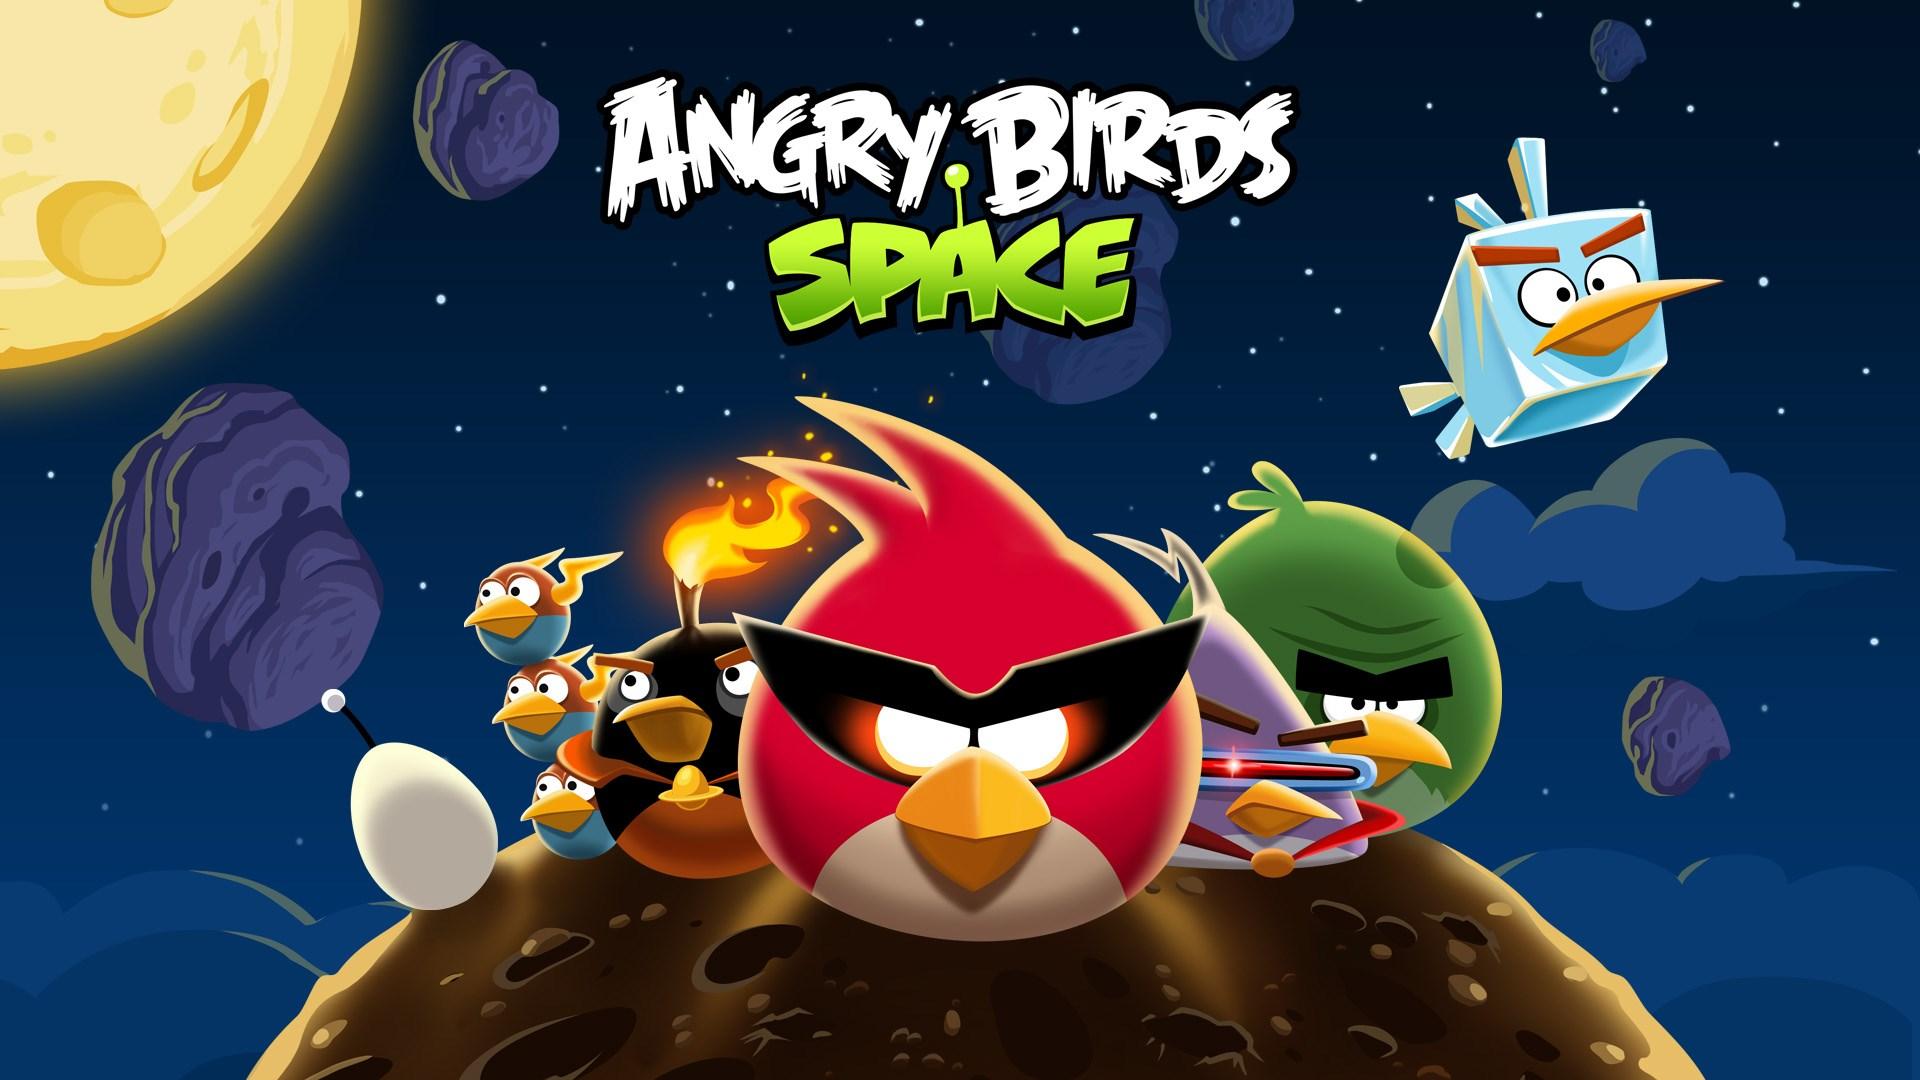 angry-birds-backround-1080p-windows-kB-Linwood-Black-wallpaper-wp3402382